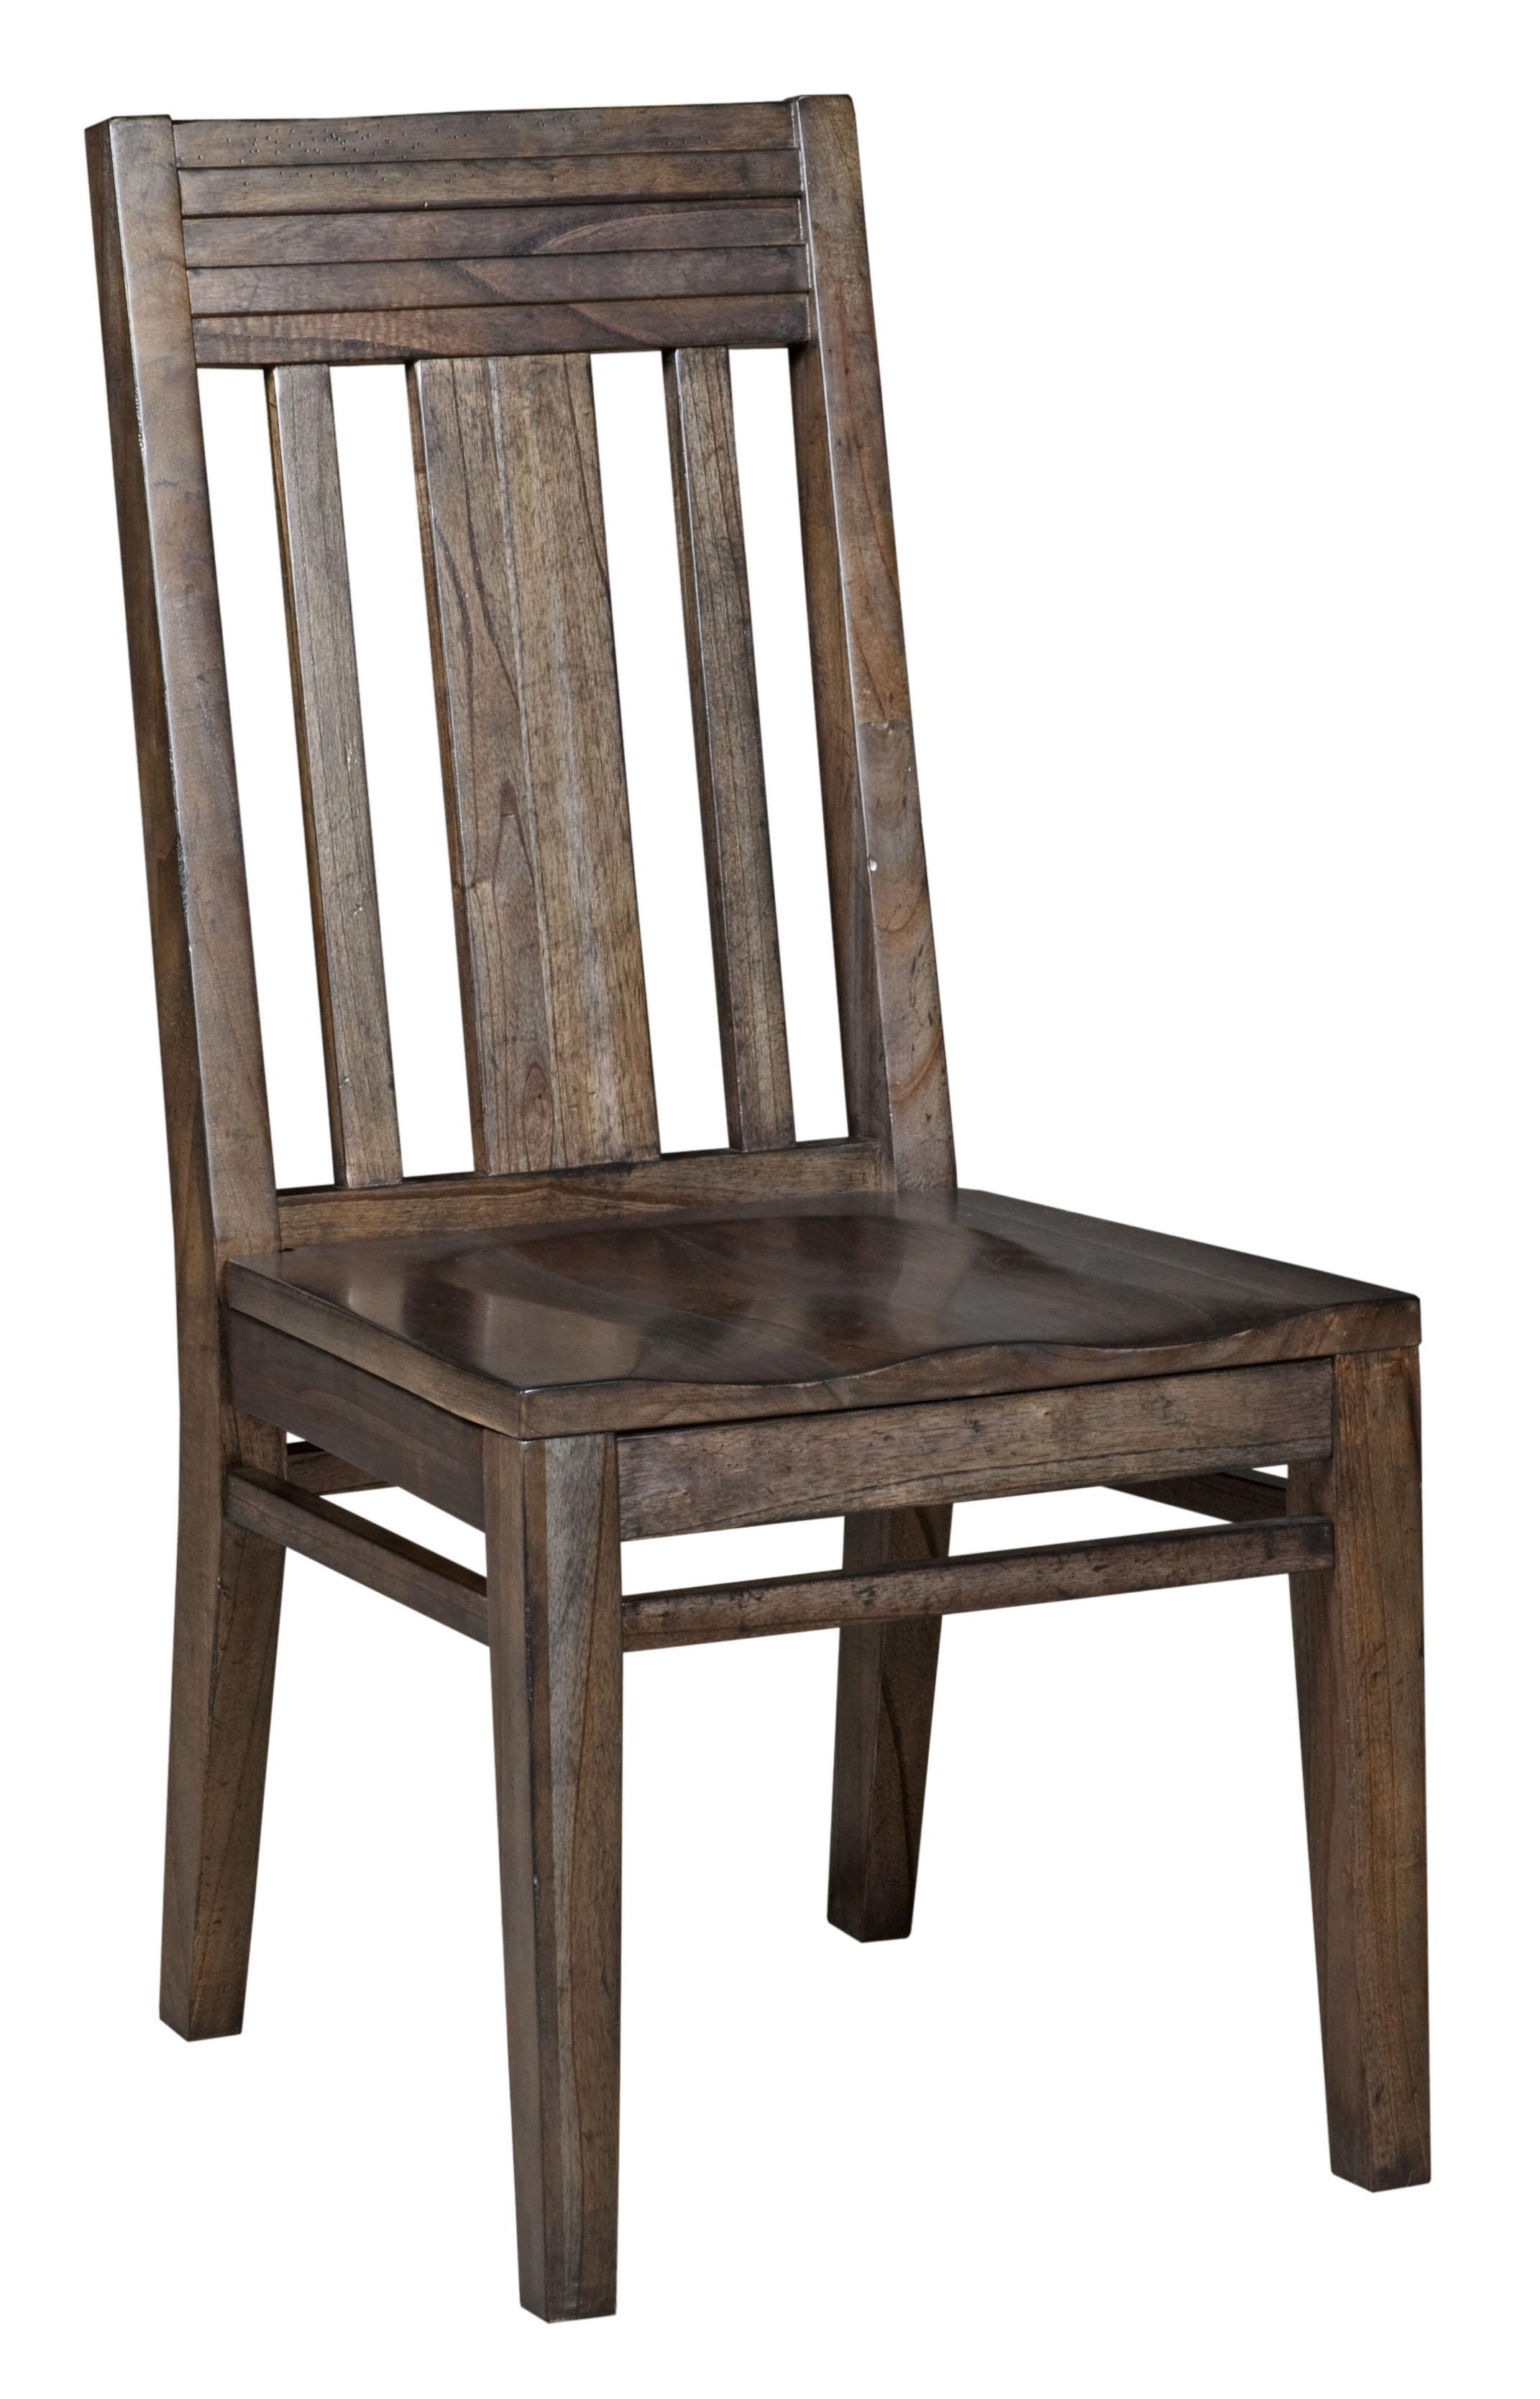 Kincaid Furniture Montreat Saluda Side Chair - Item Number: 84-061